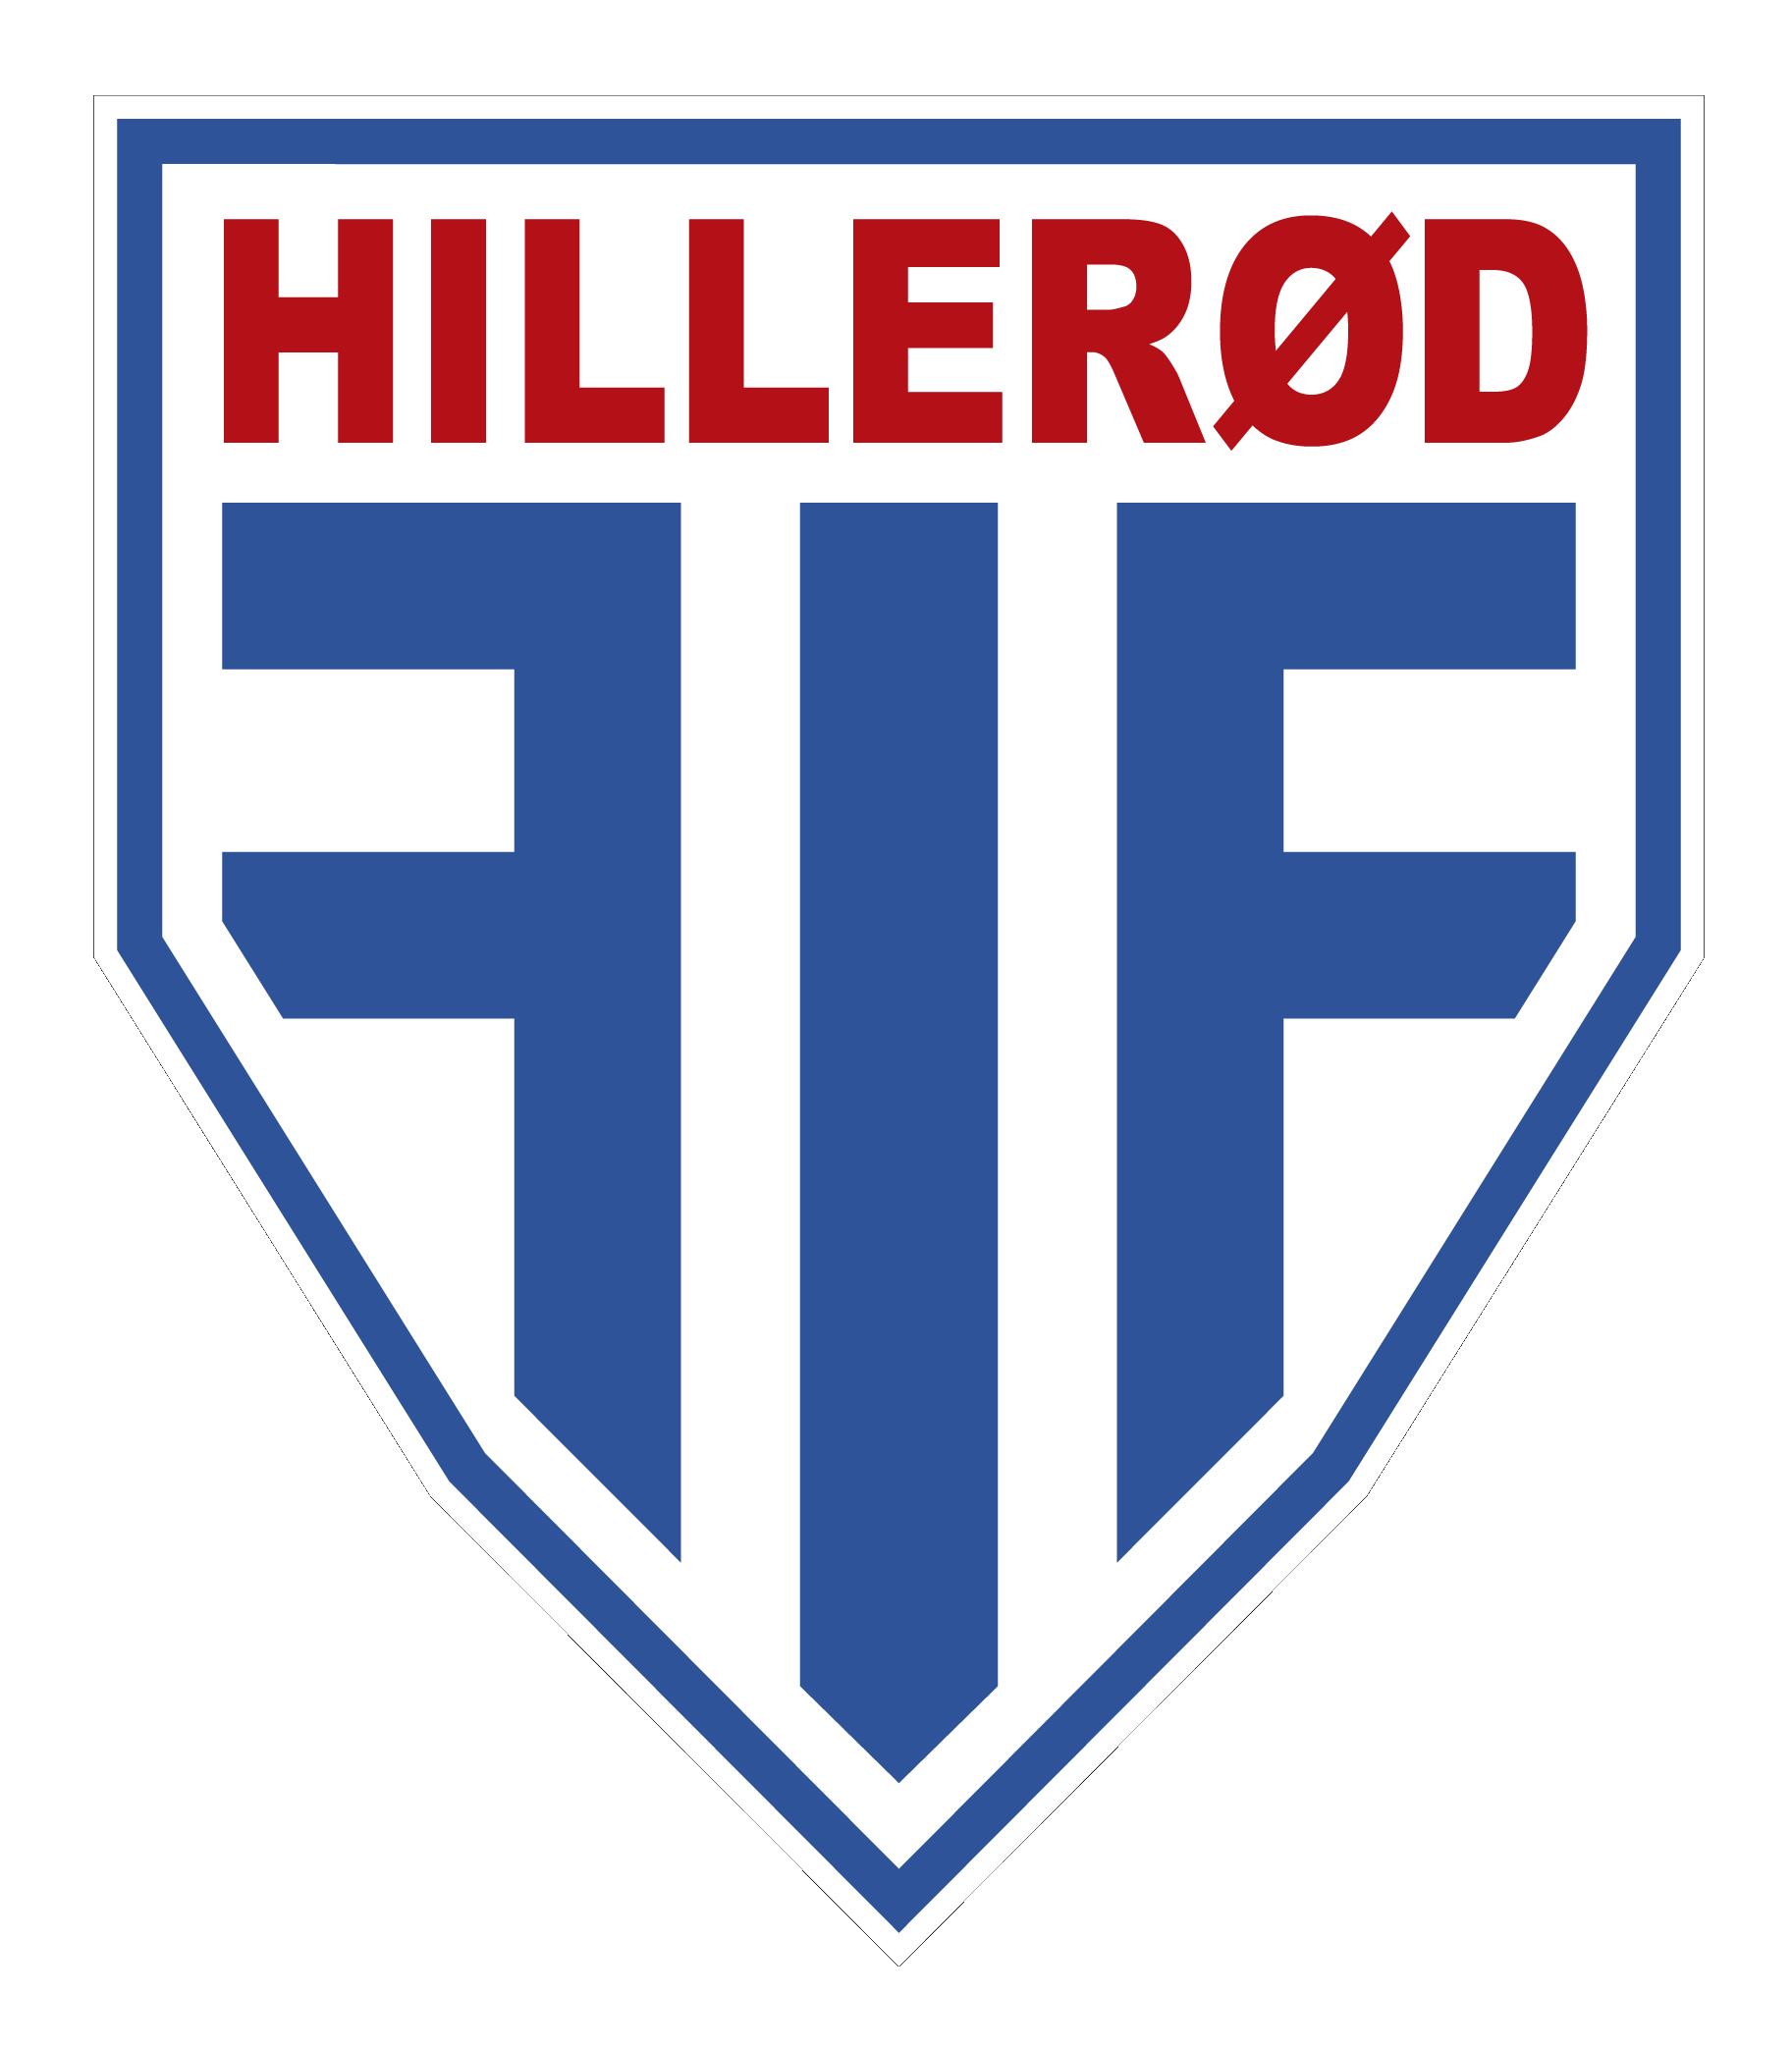 Hillerod logo